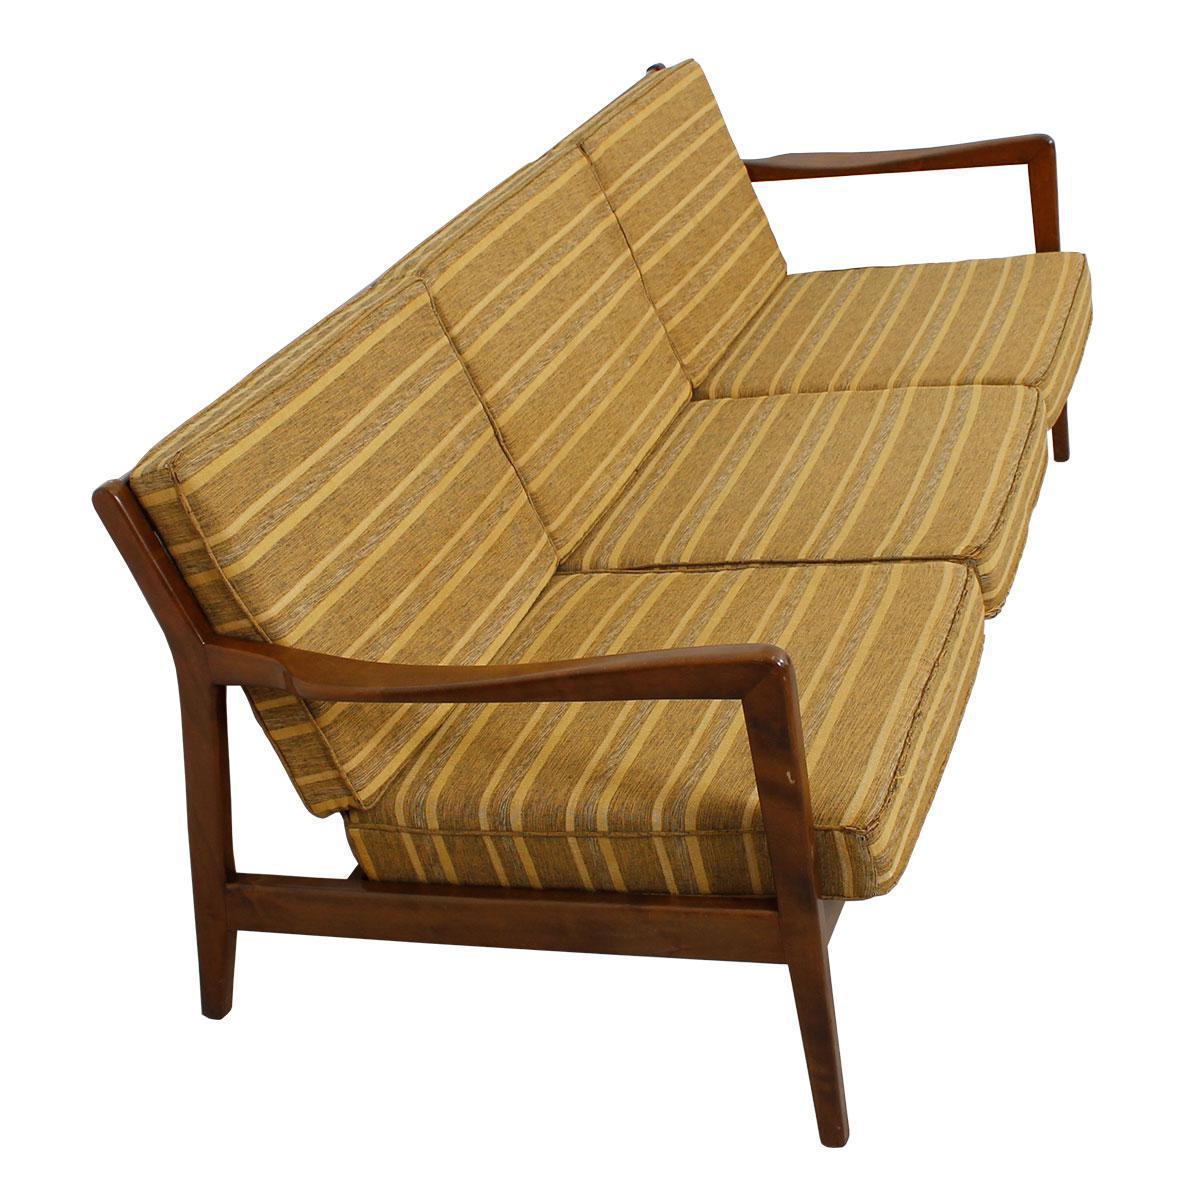 MCM/Danish Modern Walnut Frame 3-Seat Sofa with Slat Back and ...